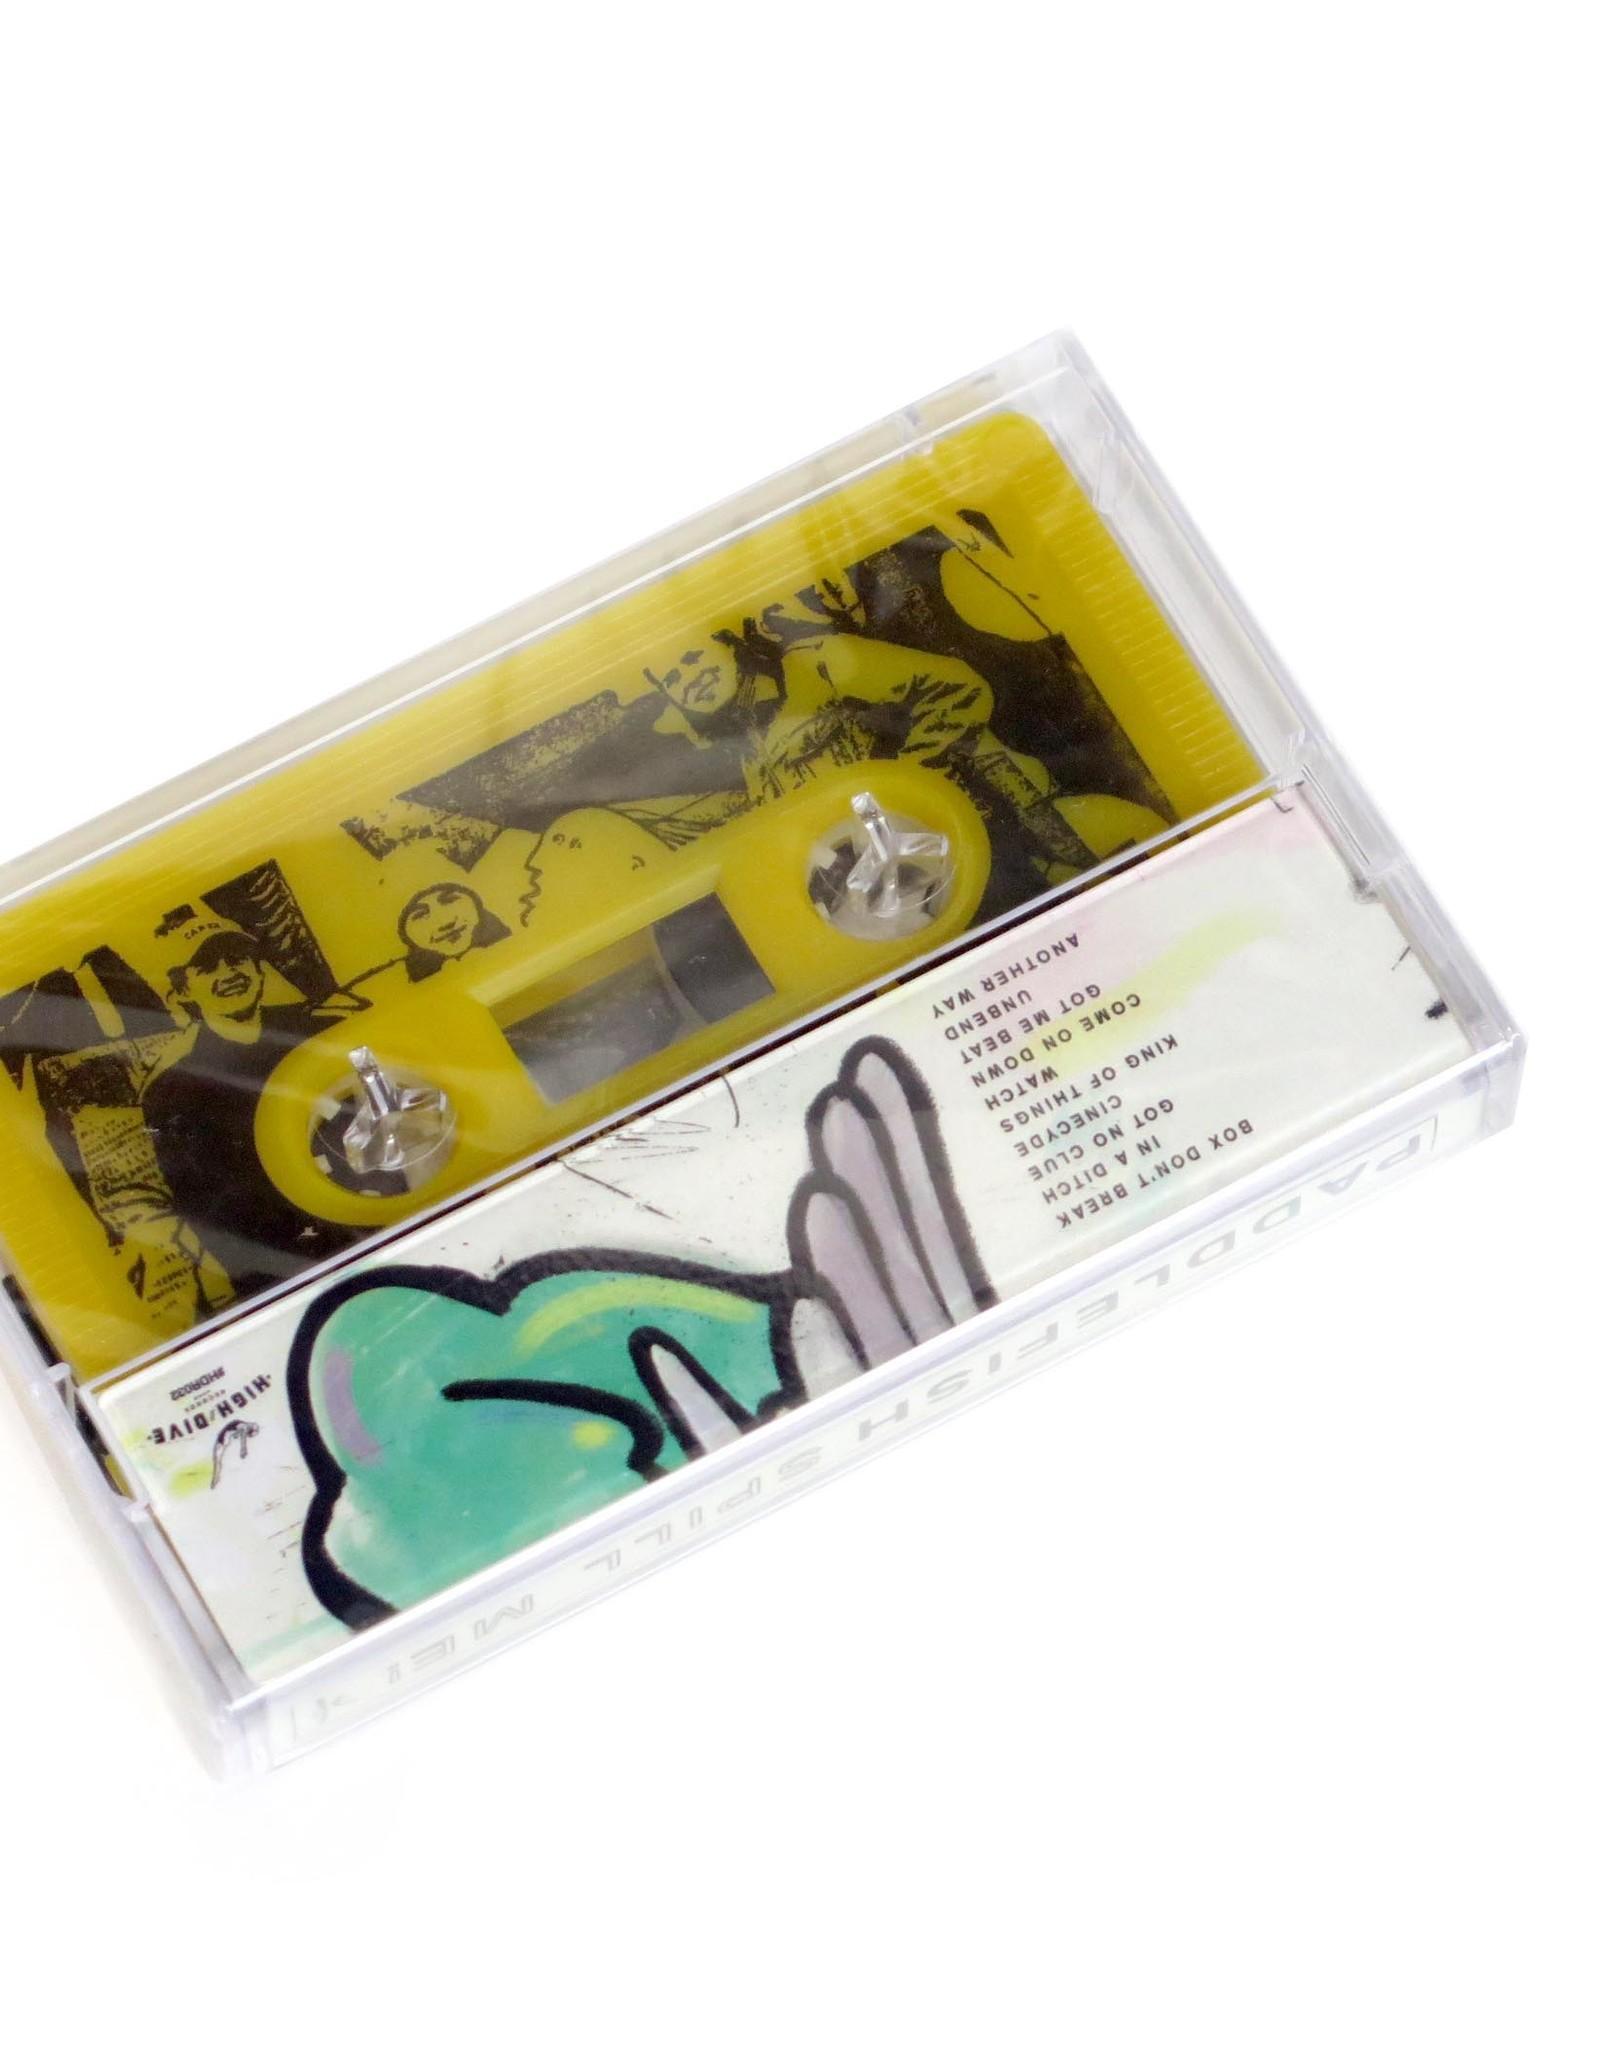 Paddlefish Spill Me! Tape by Paddlefish